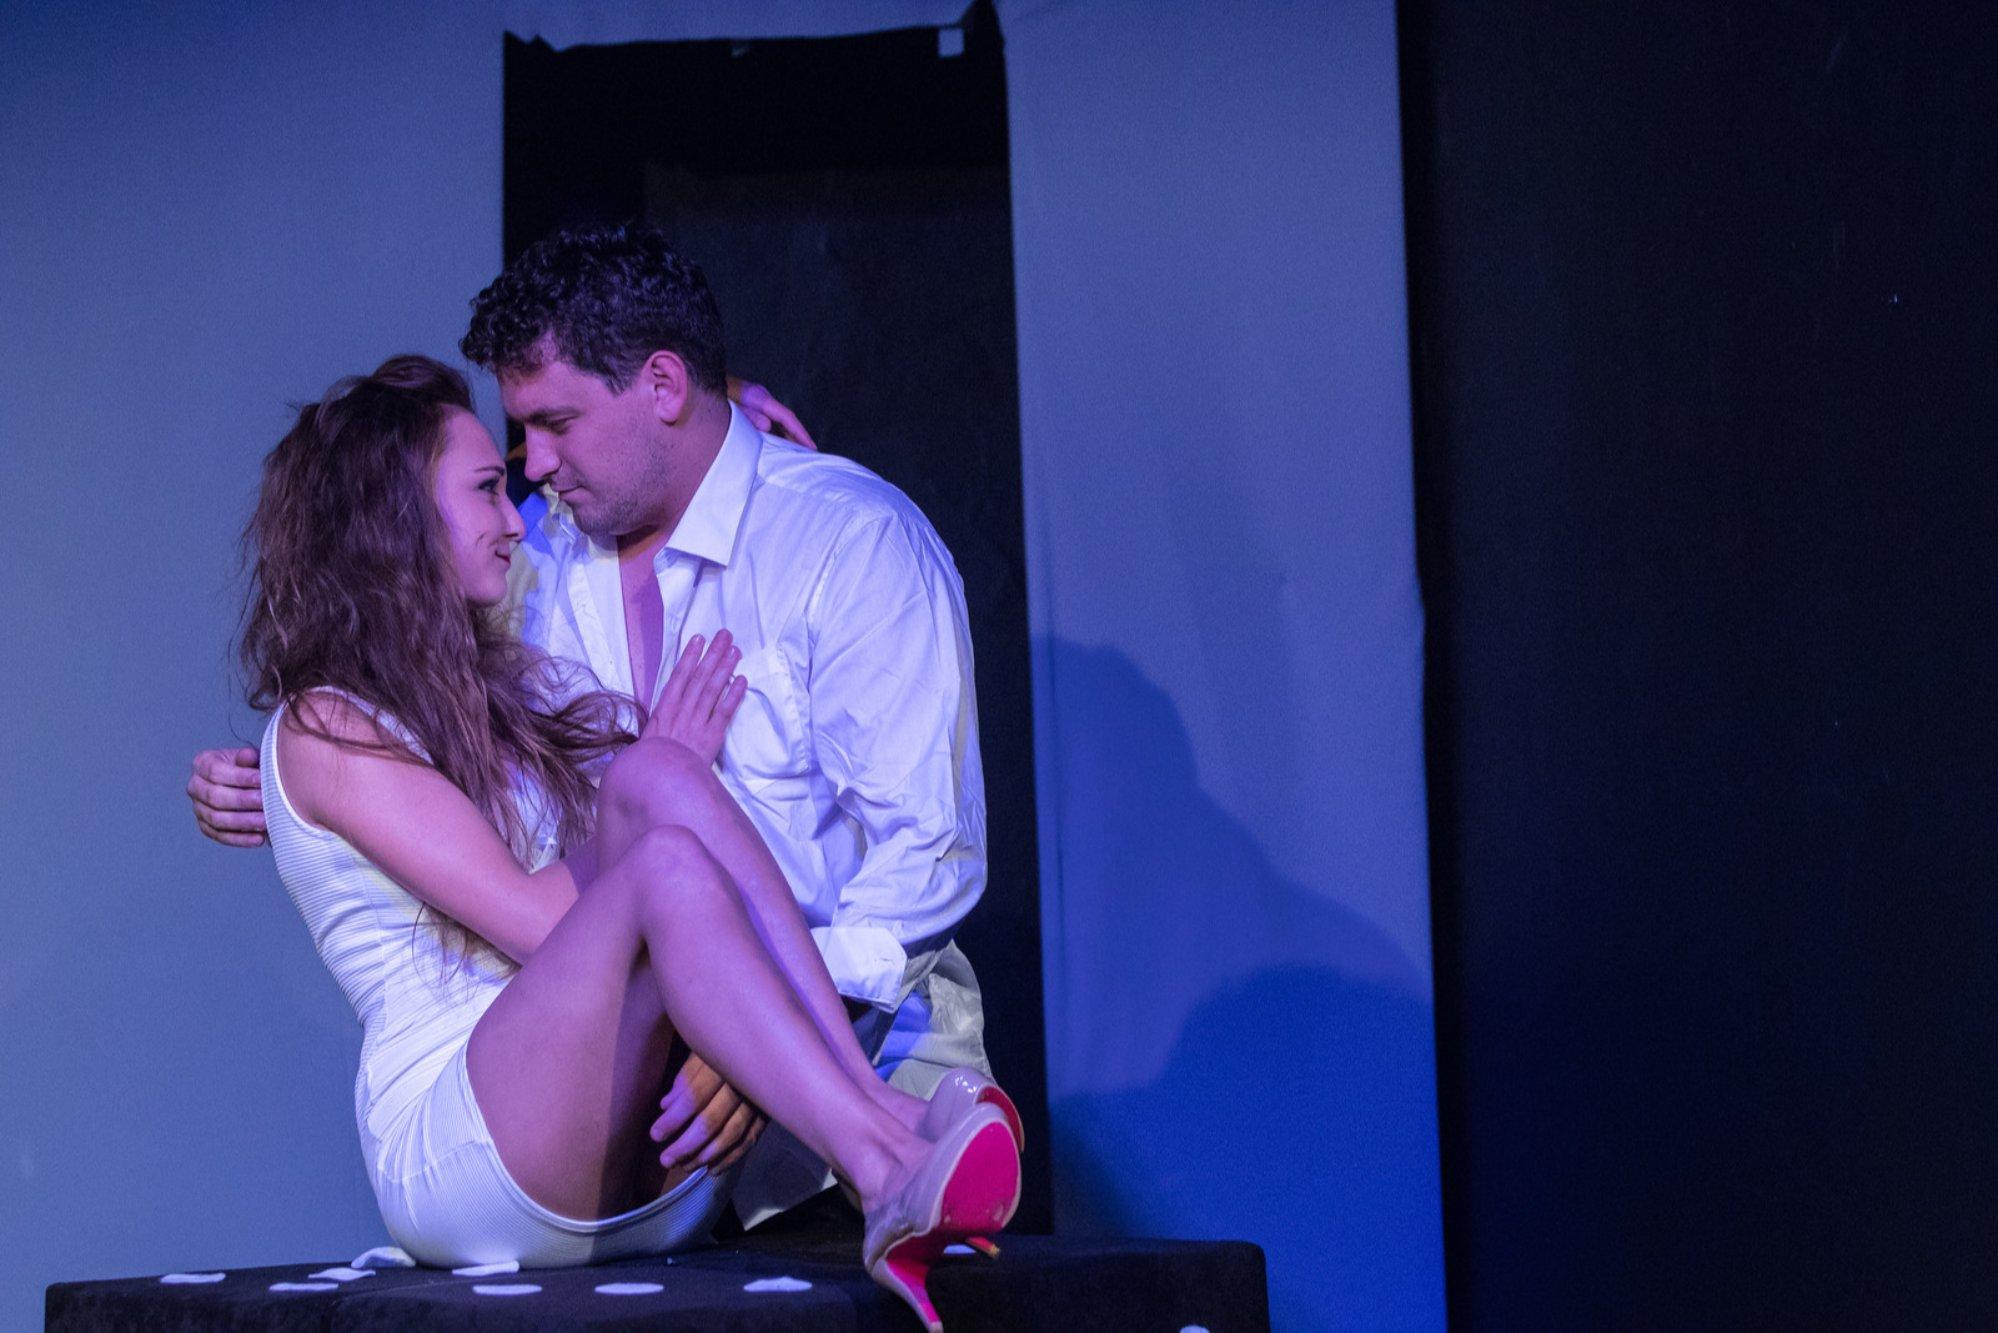 Divadlo pro sex pro dospělé